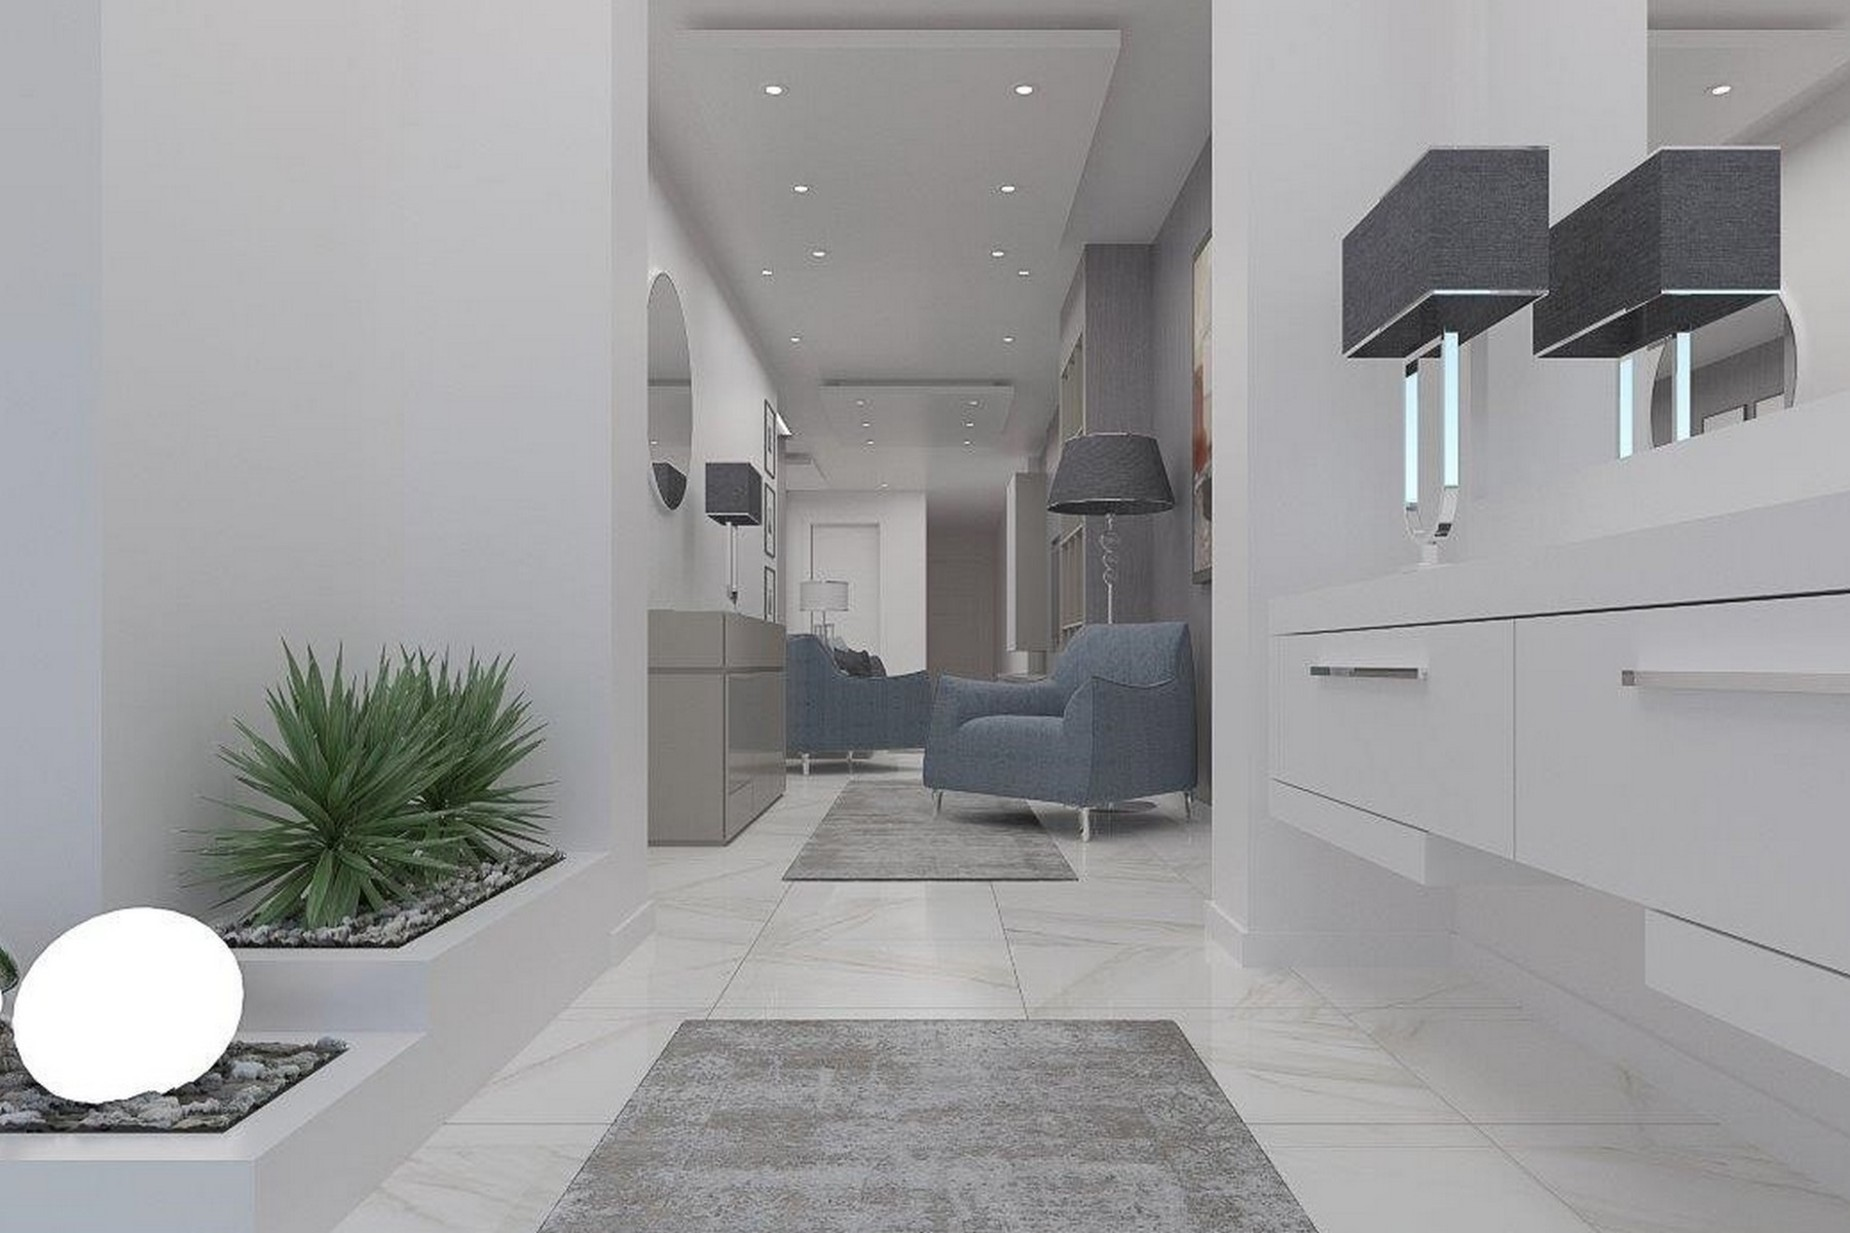 0 bed Block of Apartments (Res) For Sale in Balzan, Balzan - thumb 7